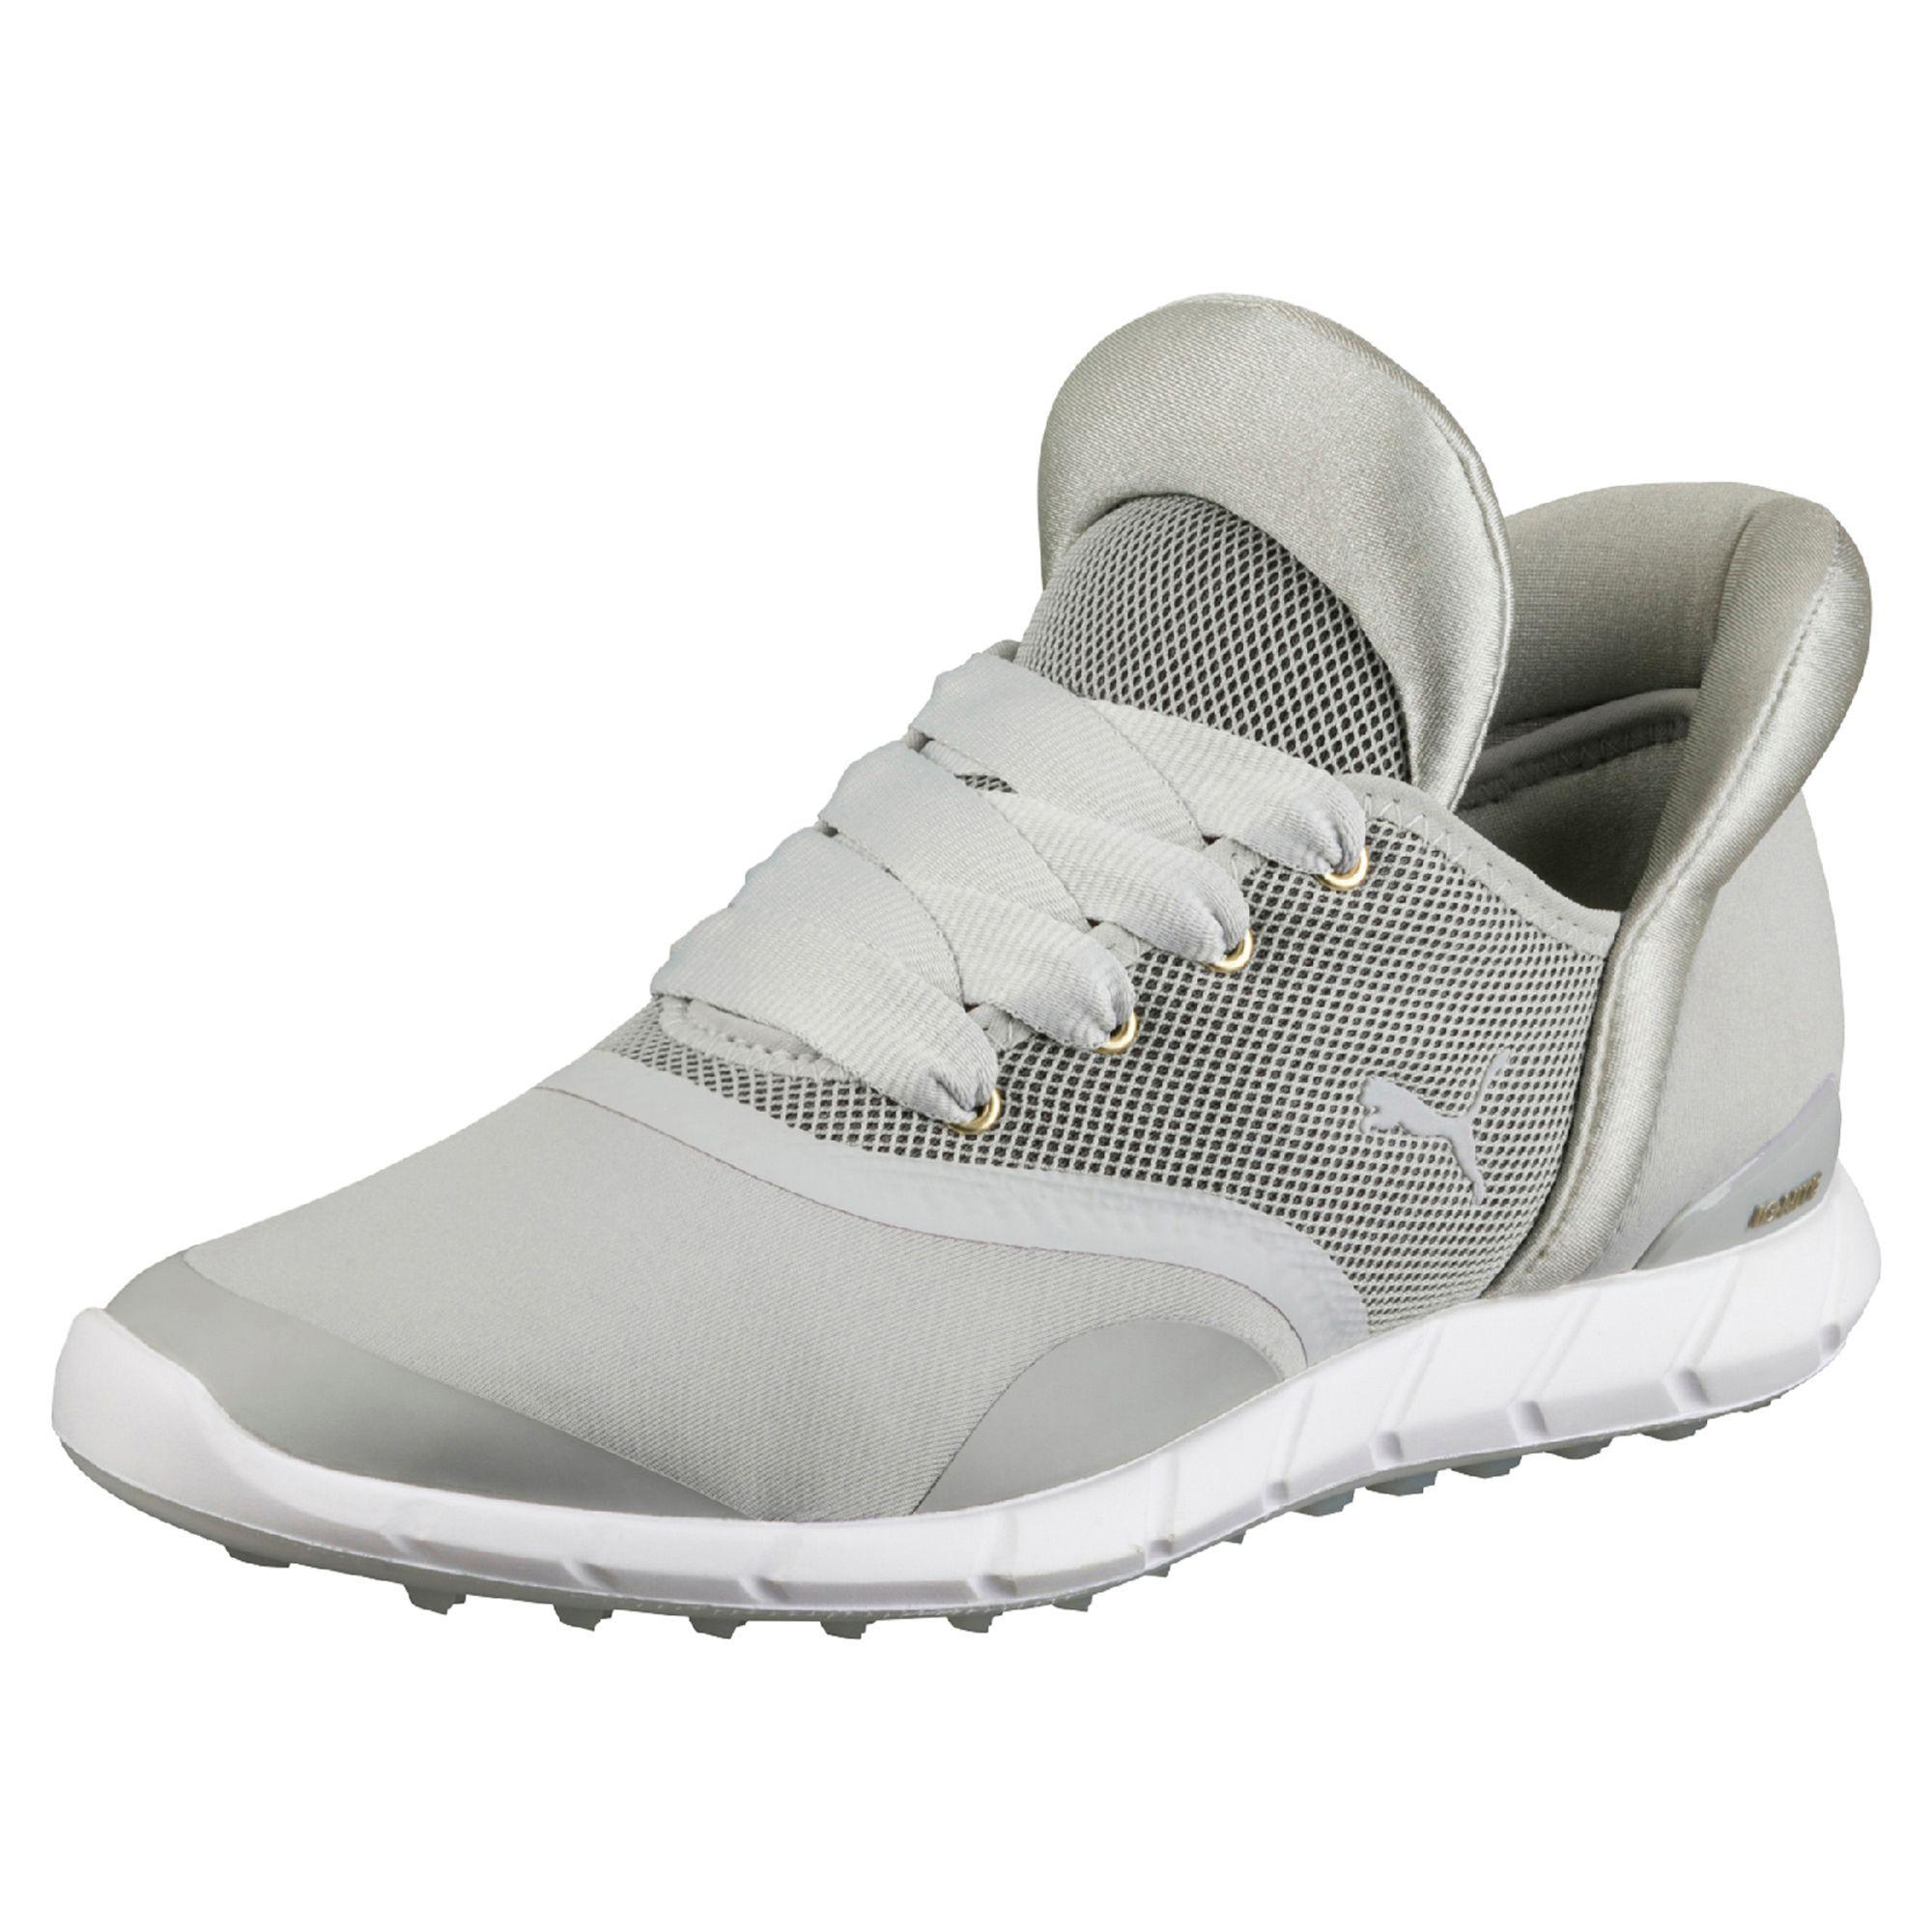 IGNITE Statement дамы обуви для гольфа